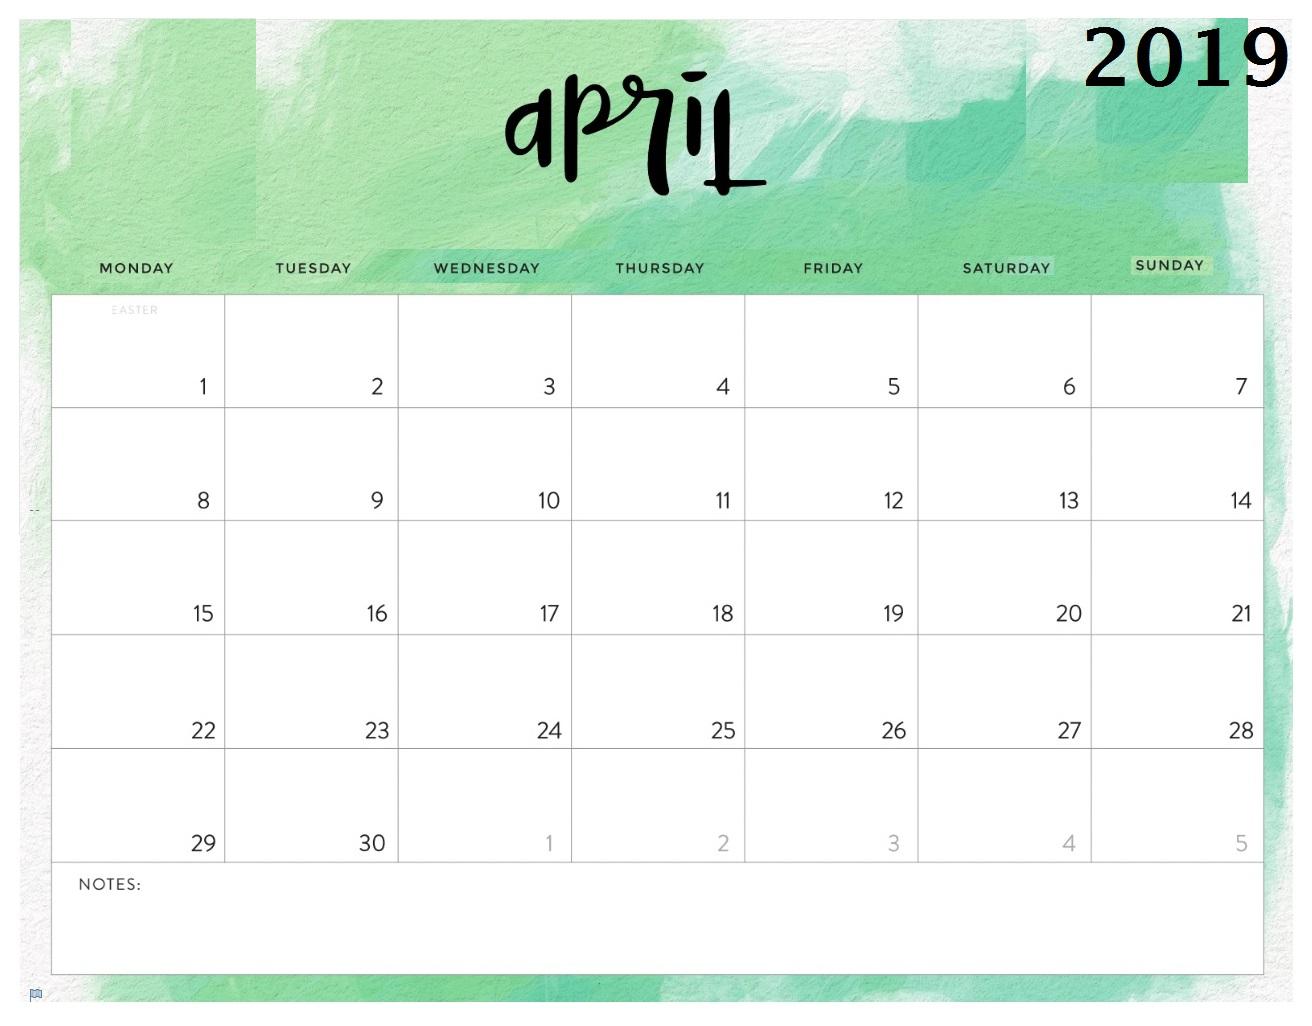 Free April 2019 Calendar To Print